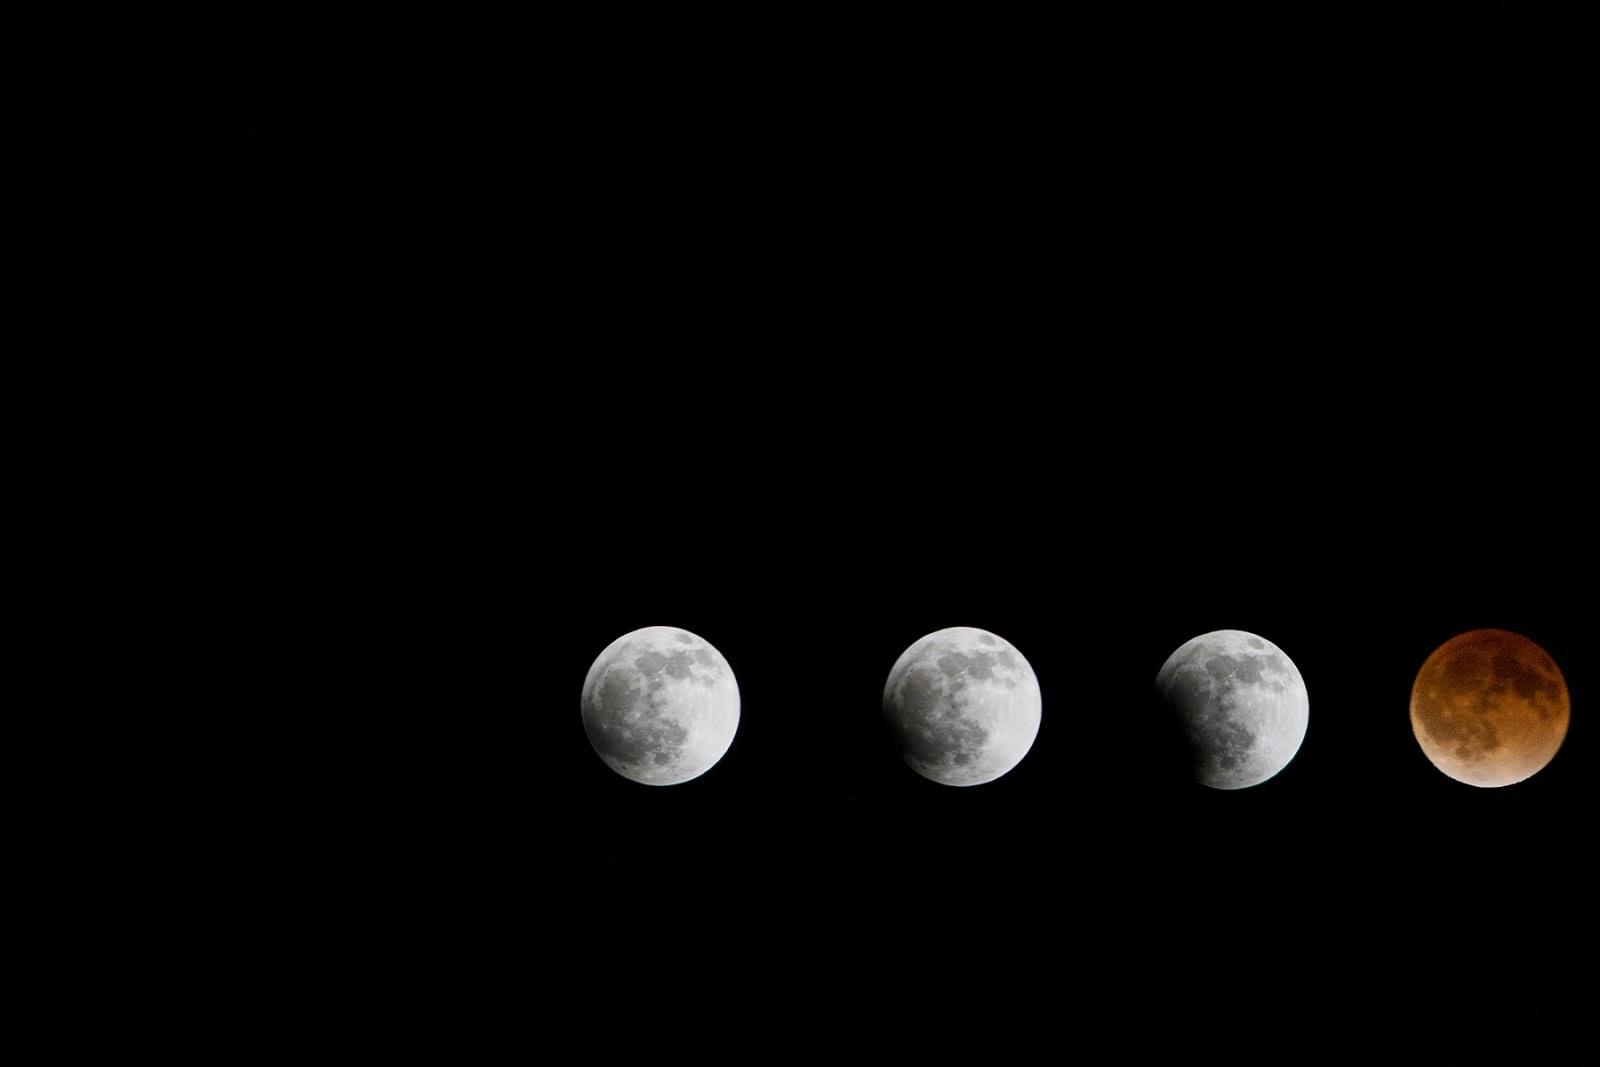 blood moon 2019 arizona - photo #43